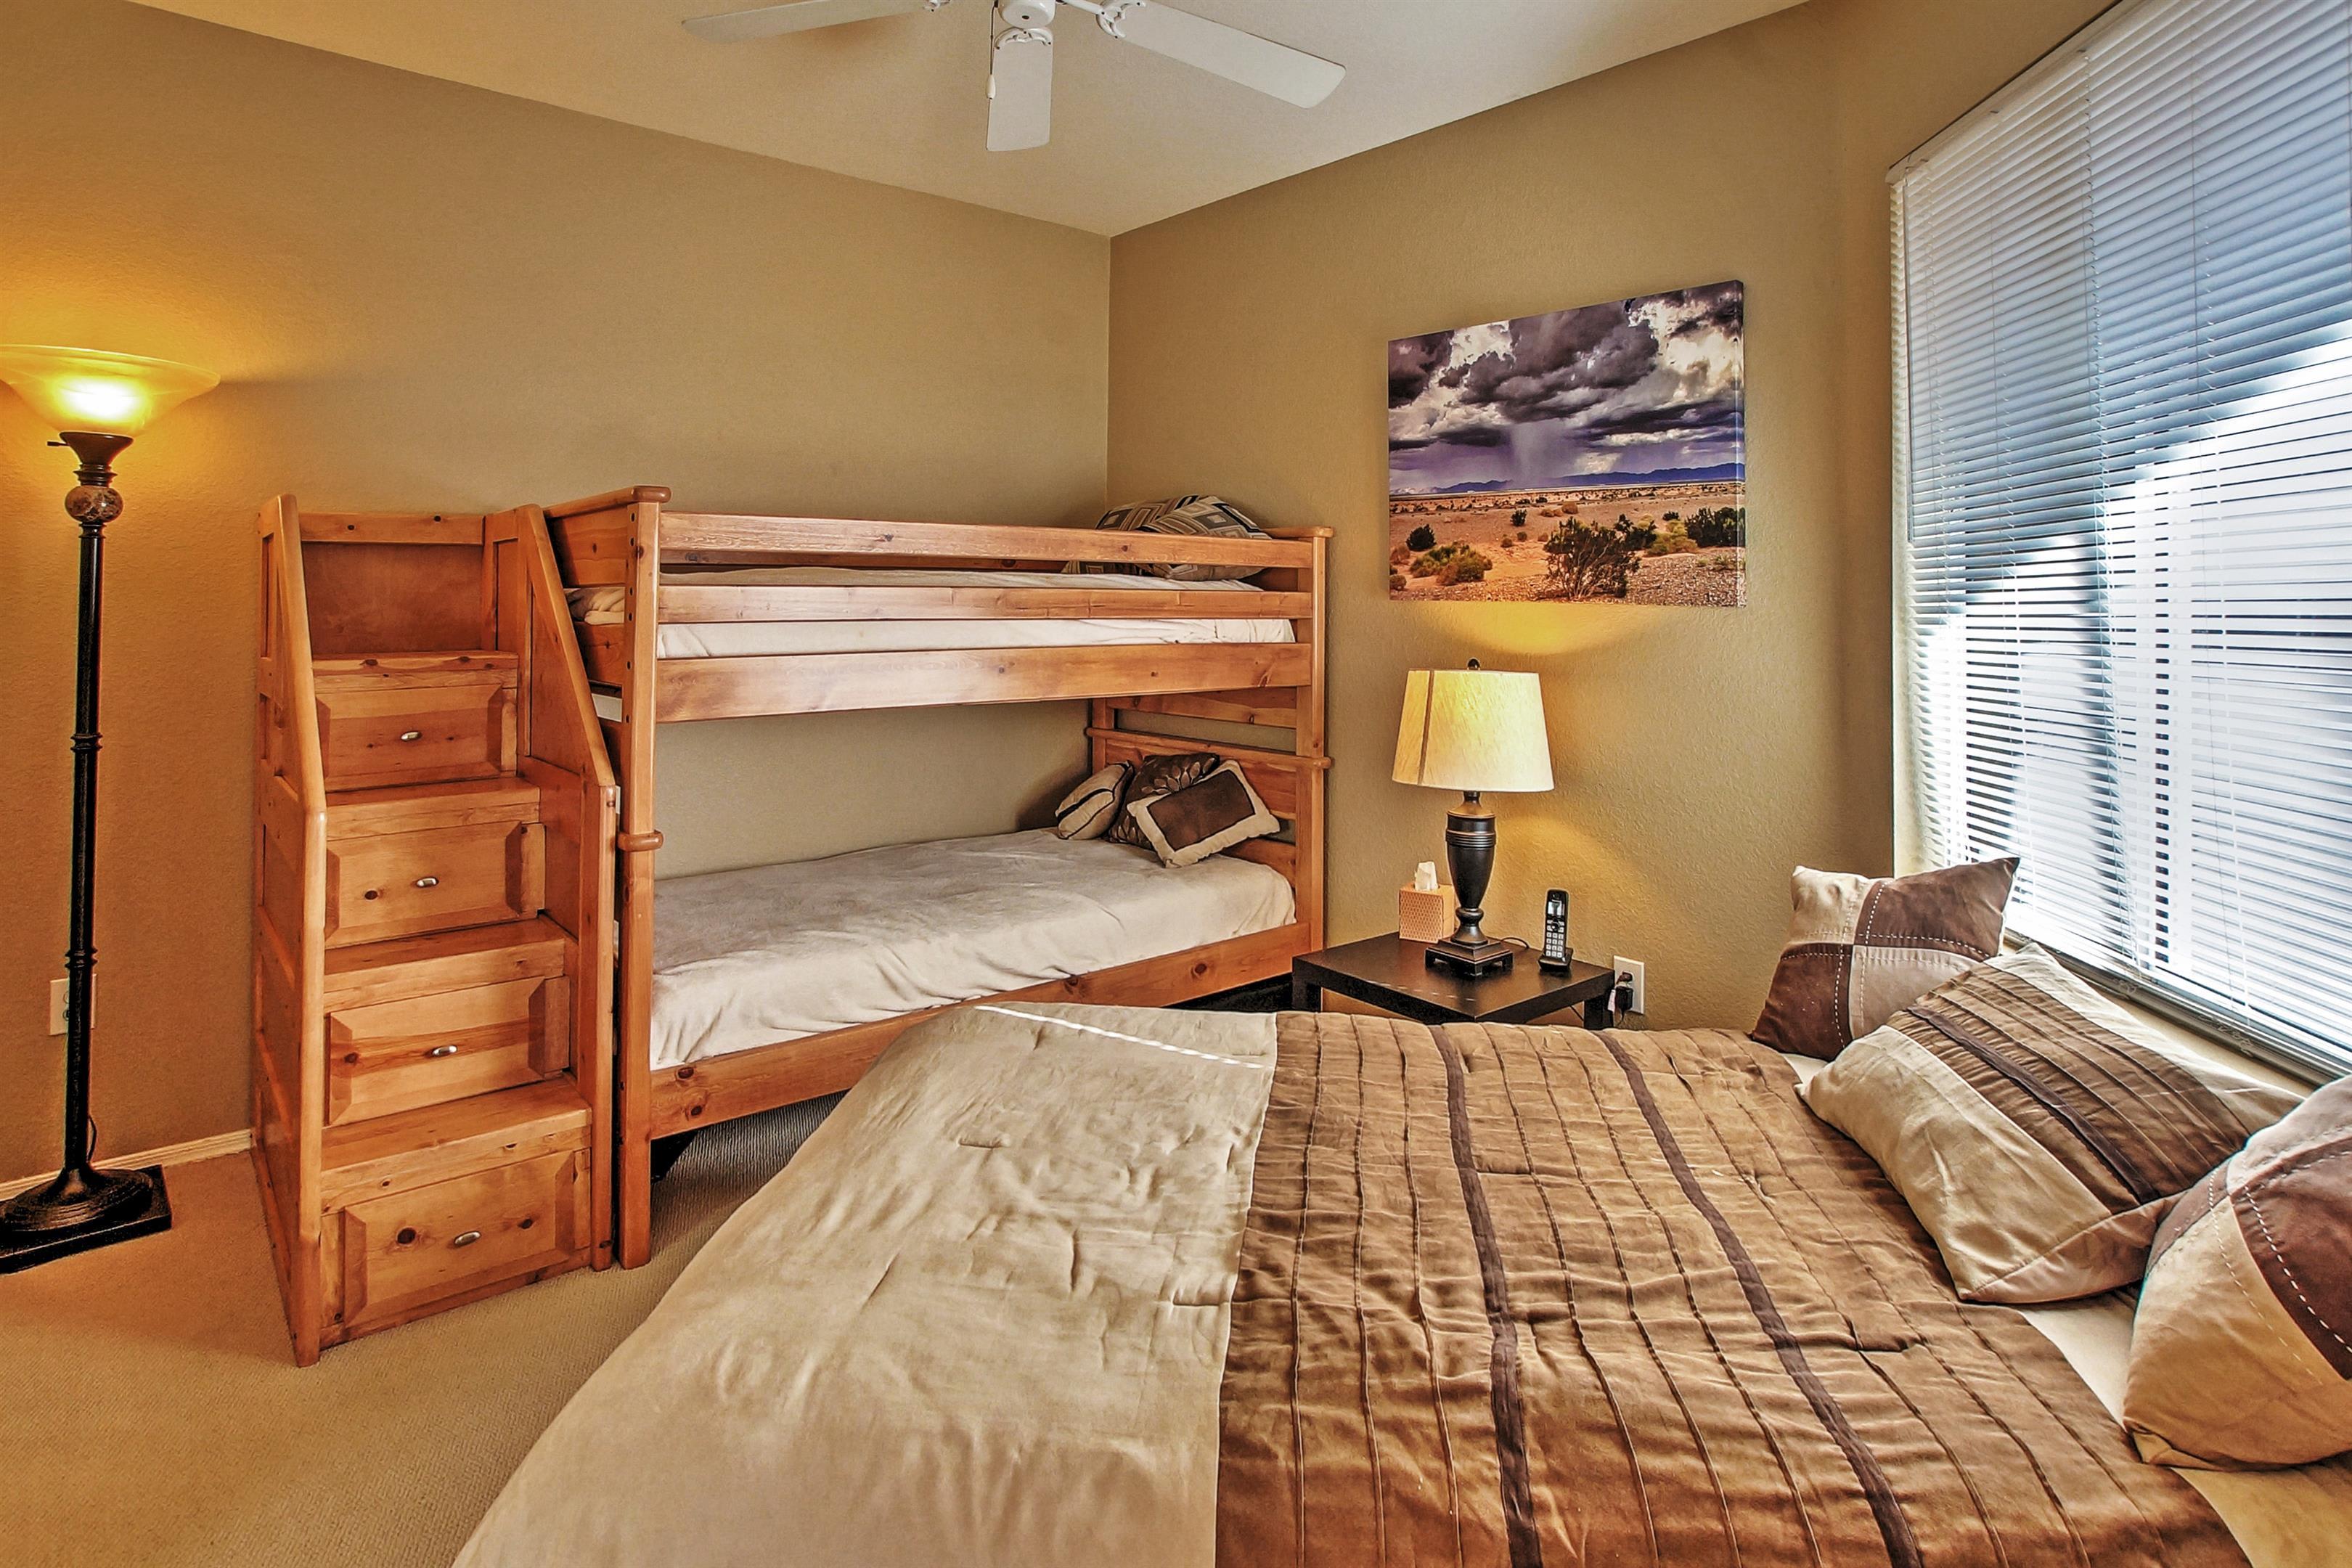 Bedroom 2 | Full Bed | Twin Bunk Bed